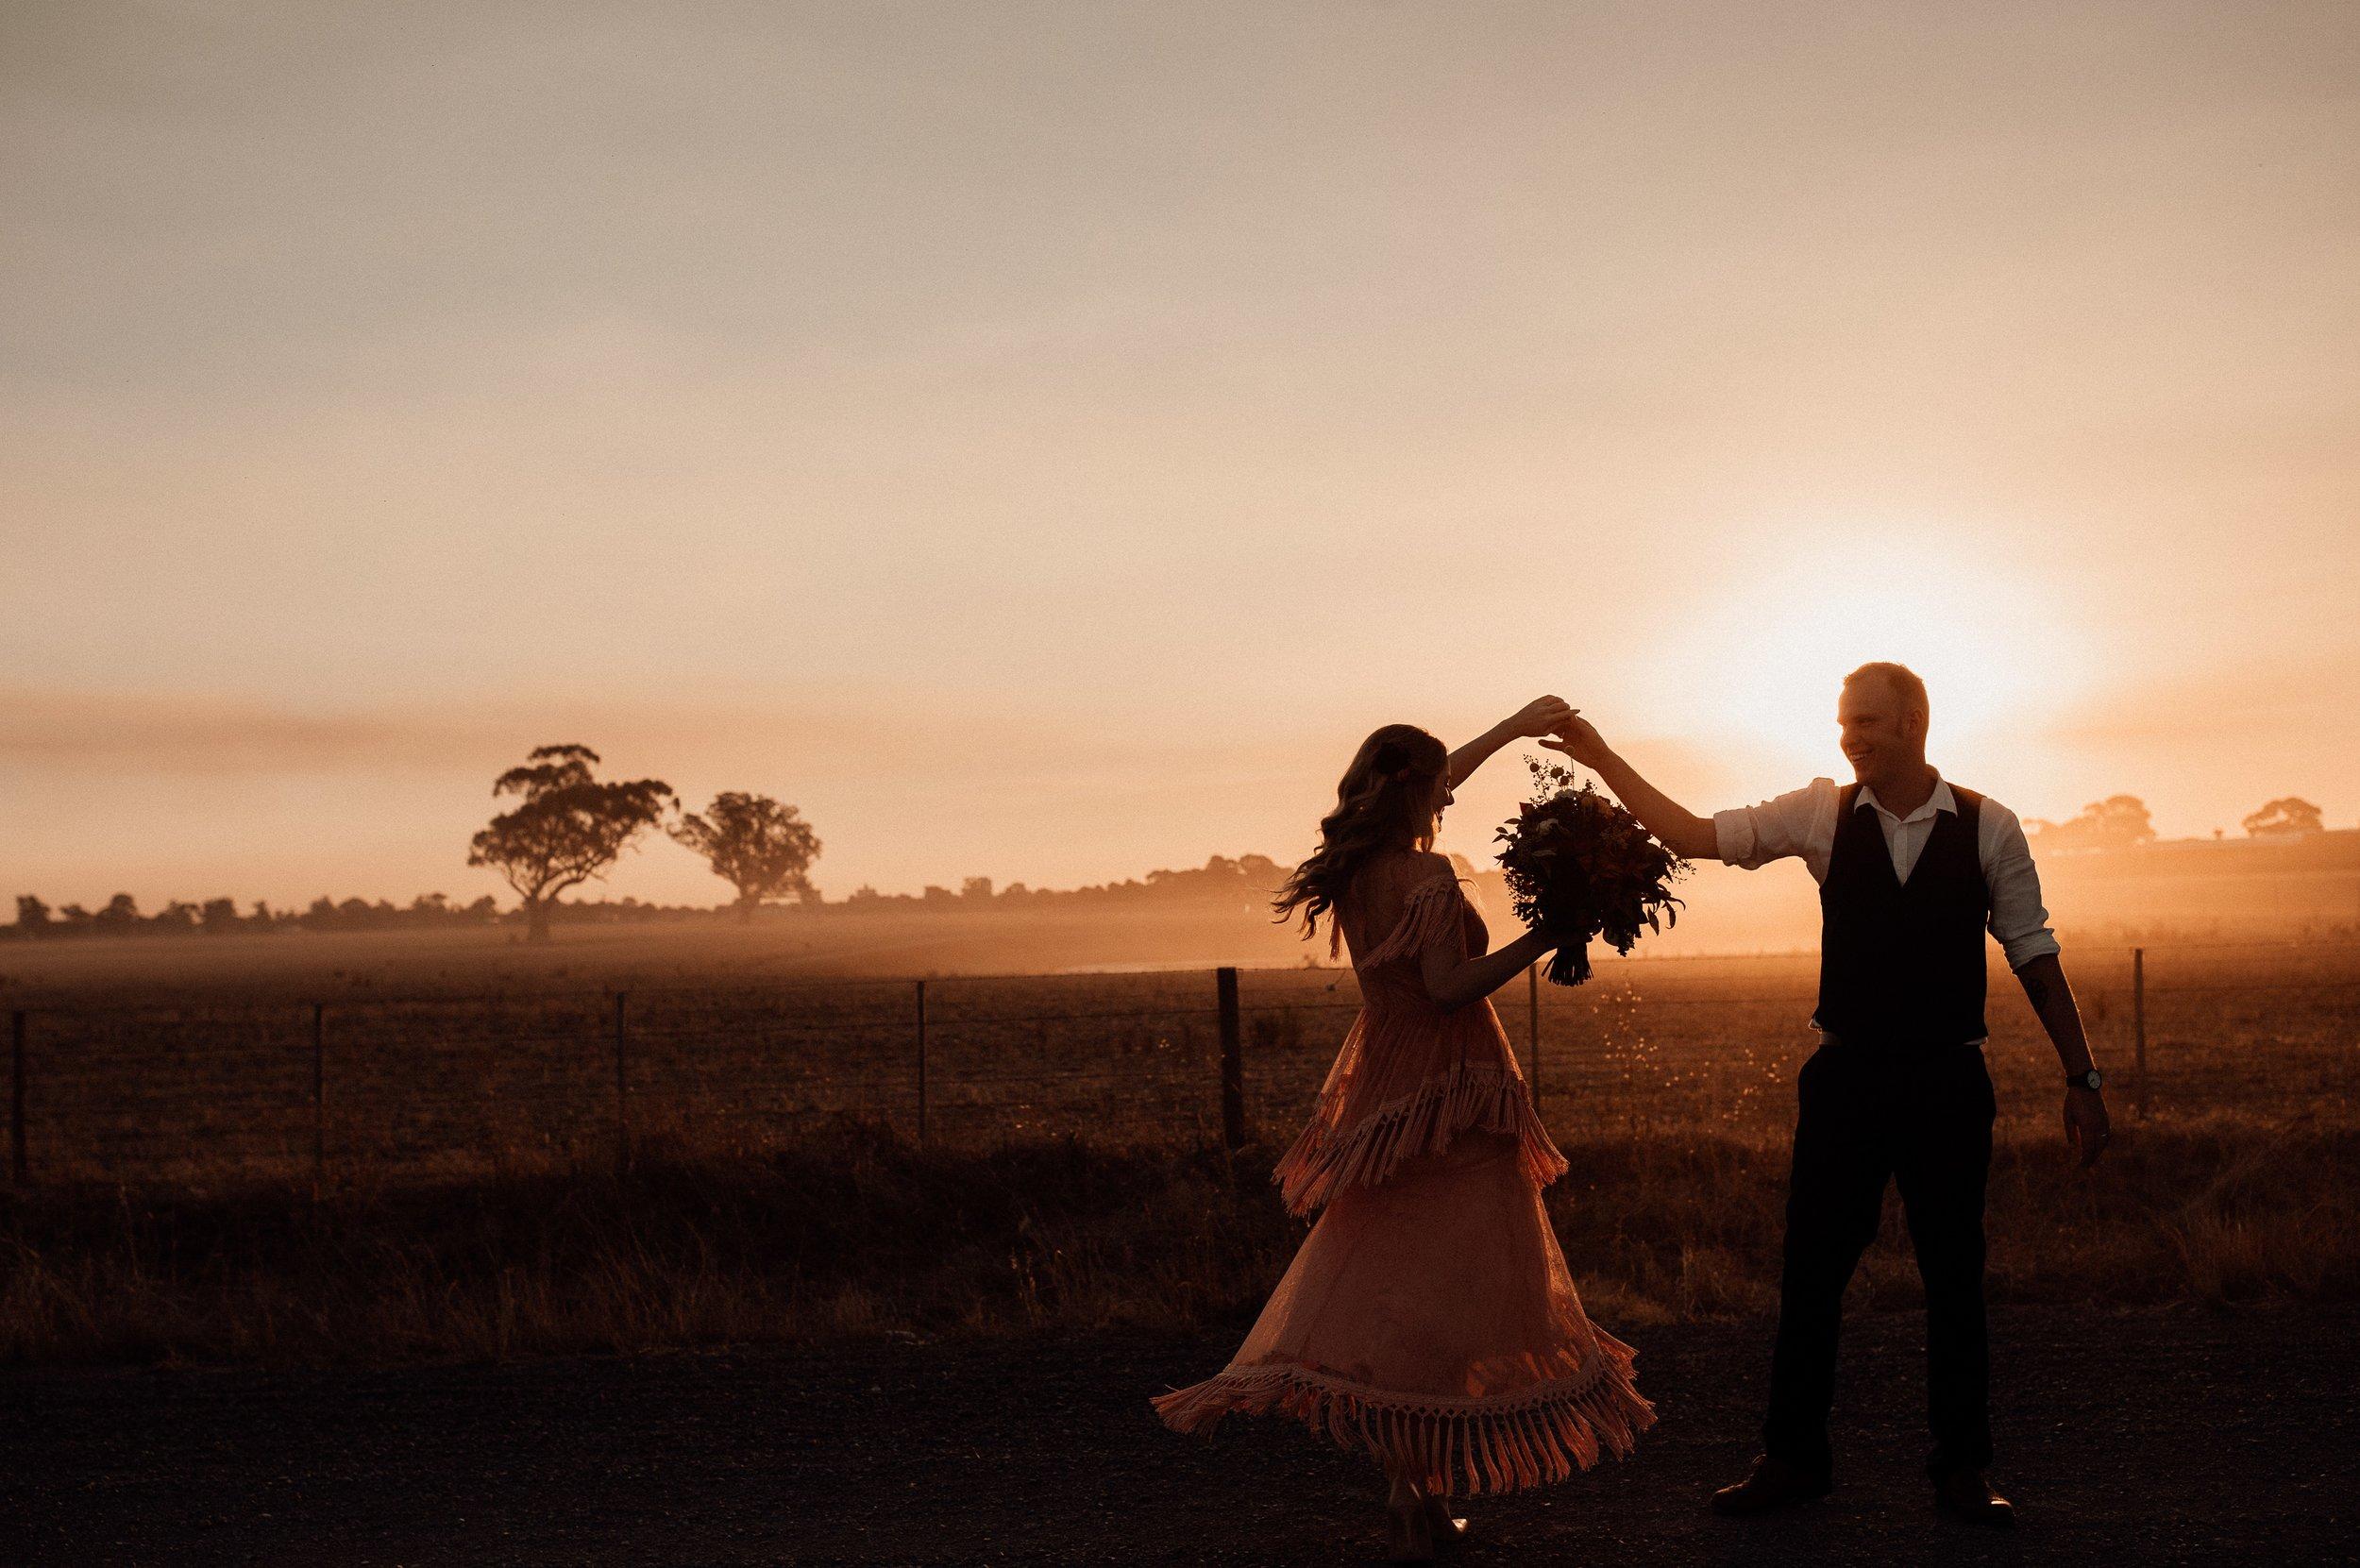 mickalathomas_puremacphotography_weddingphotographer_couplephotographer_Sheppartonphotographer_2150.jpg